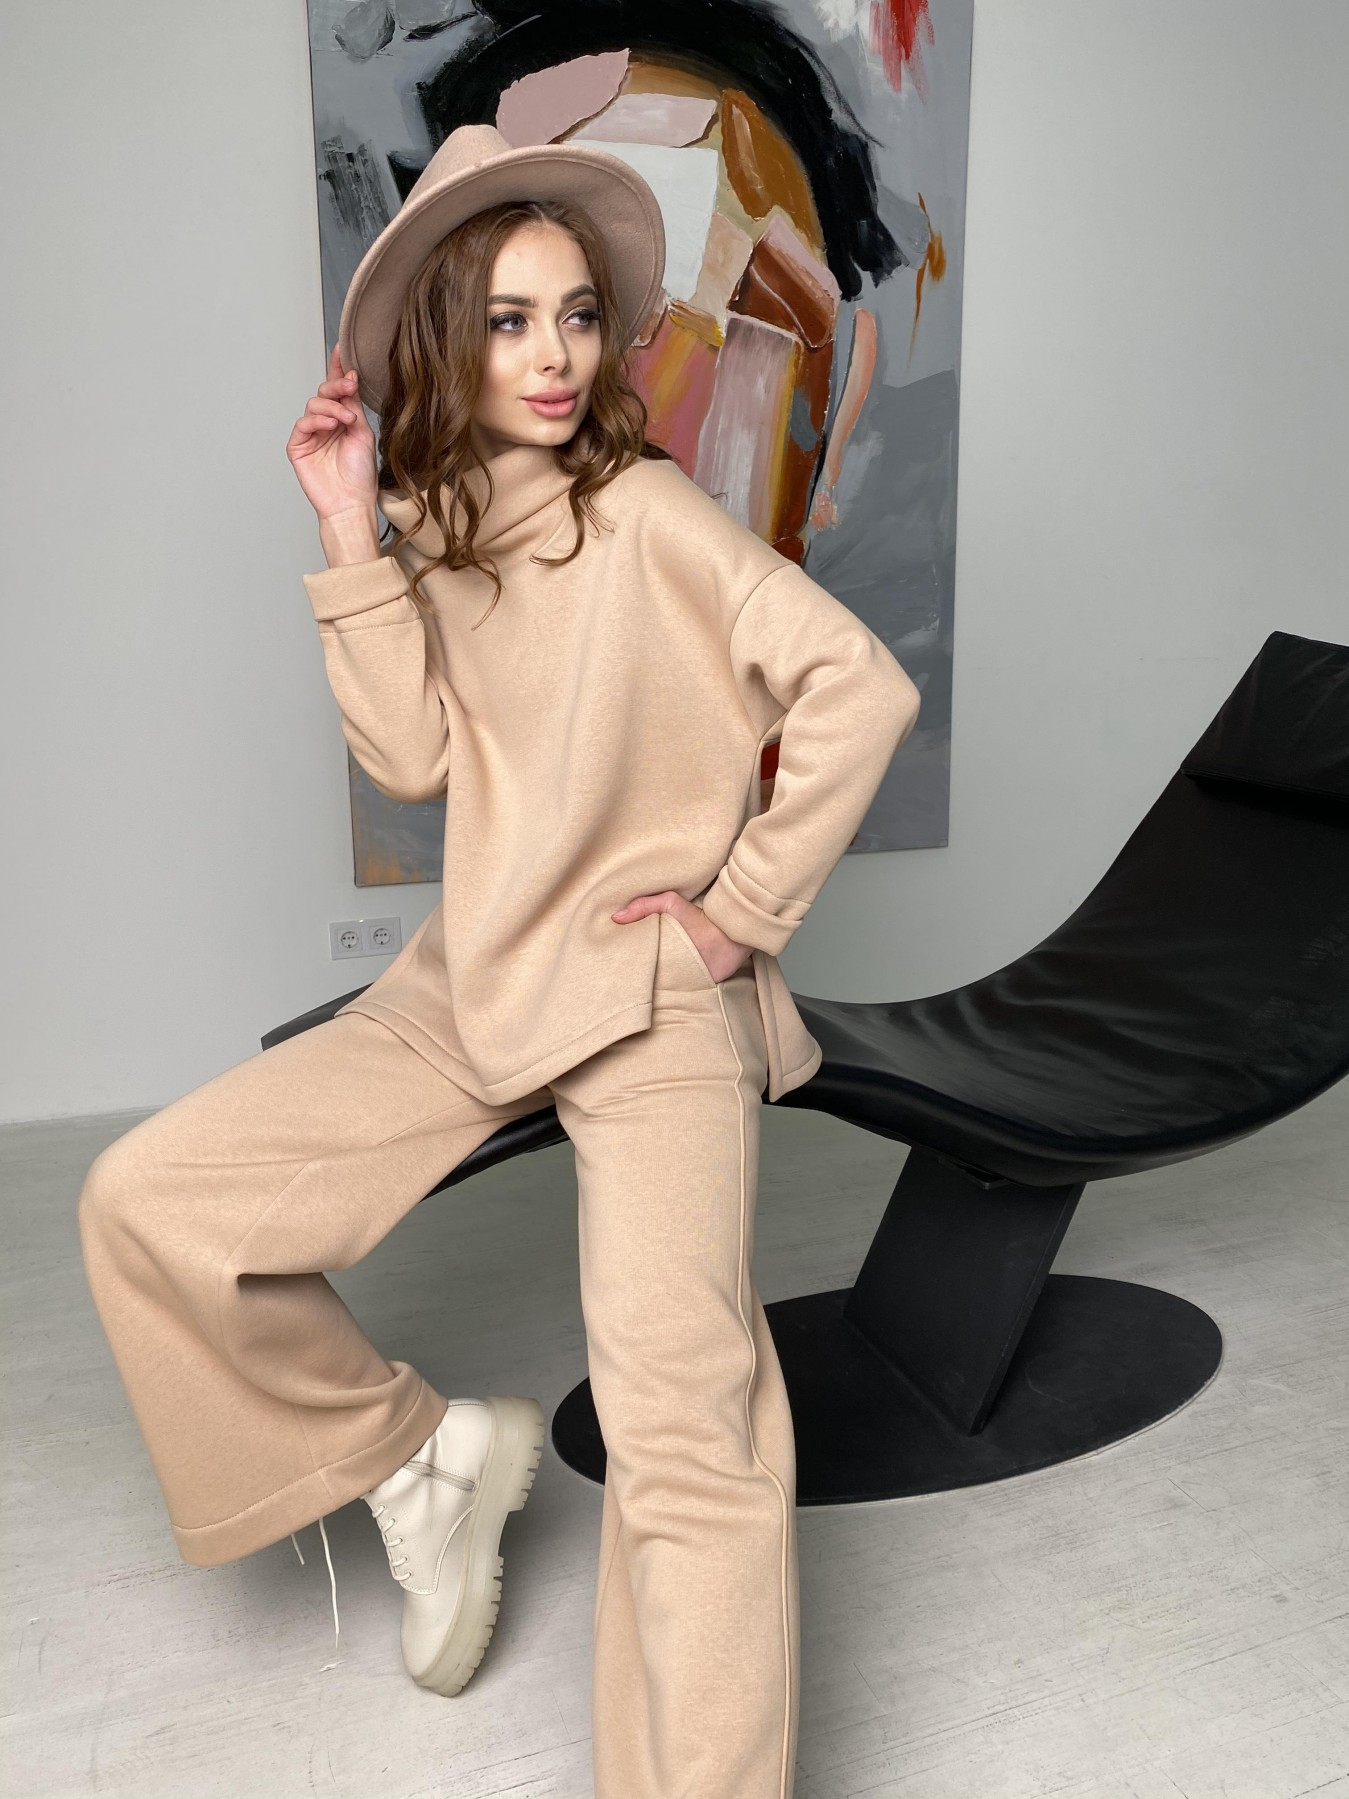 Джаст костюм на флисе 3х нитка 10513 АРТ. 46846 Цвет: Бежевый - фото 8, интернет магазин tm-modus.ru